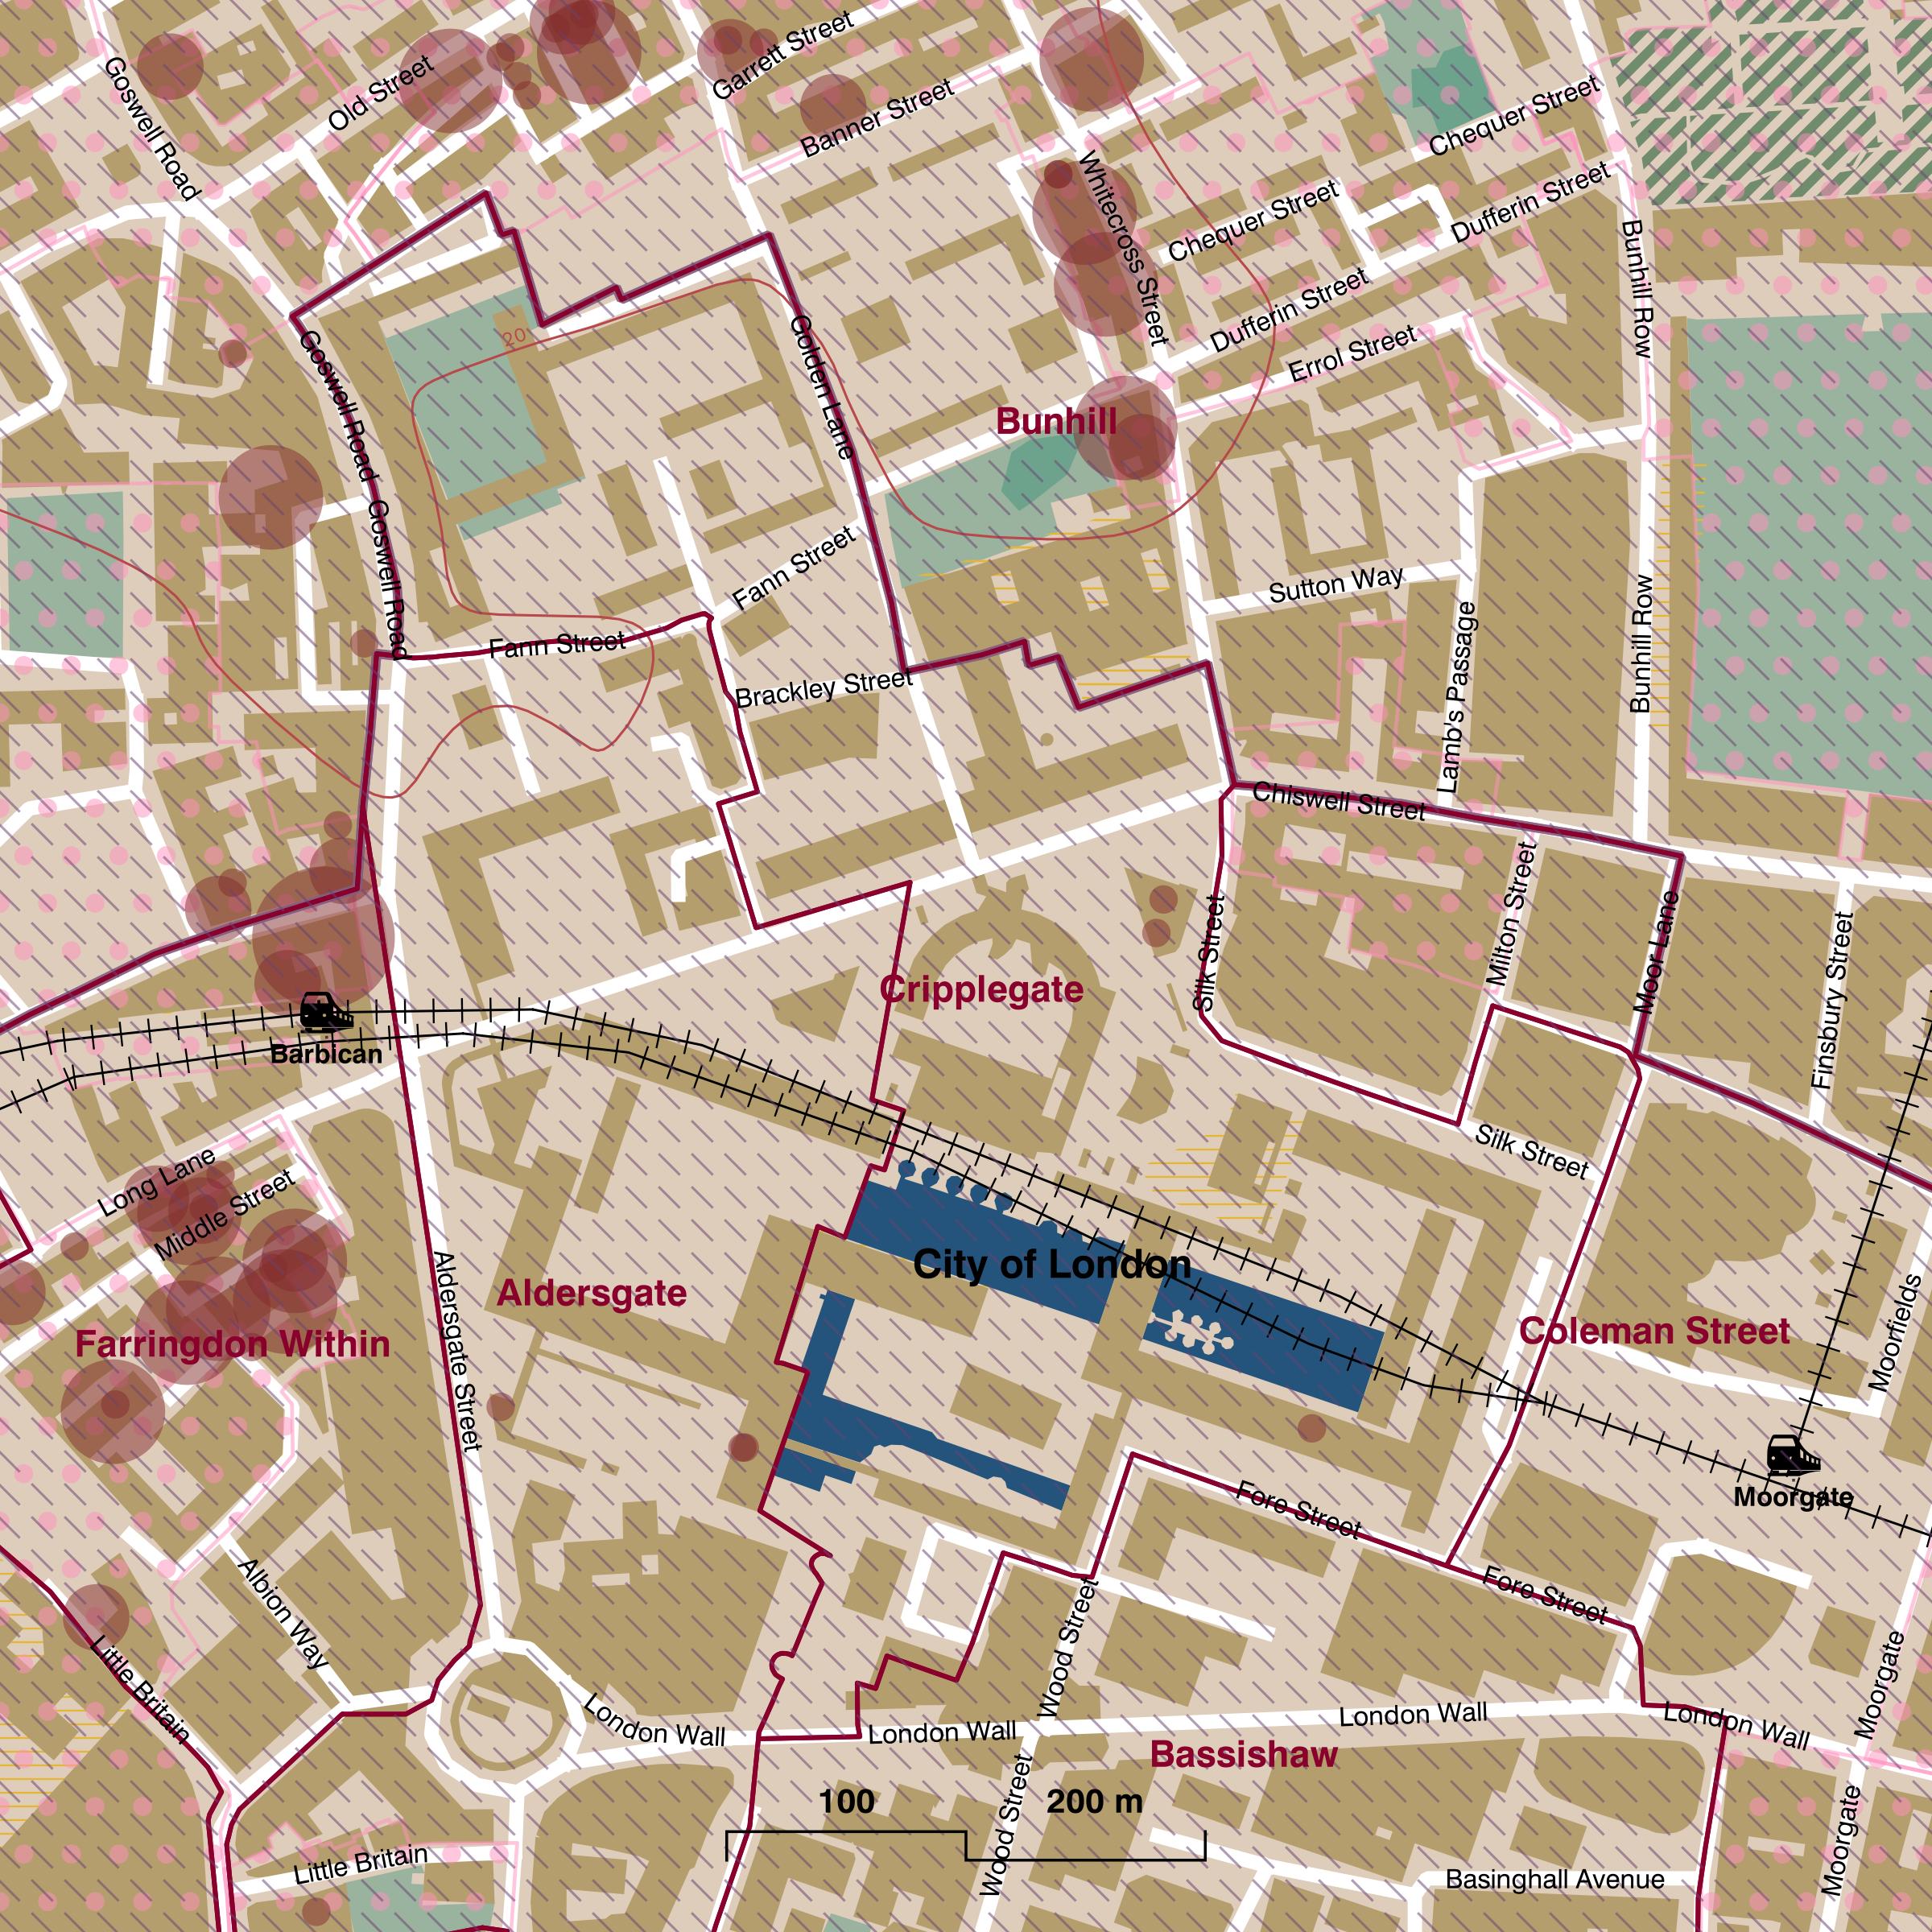 Map of Cripplegate ward